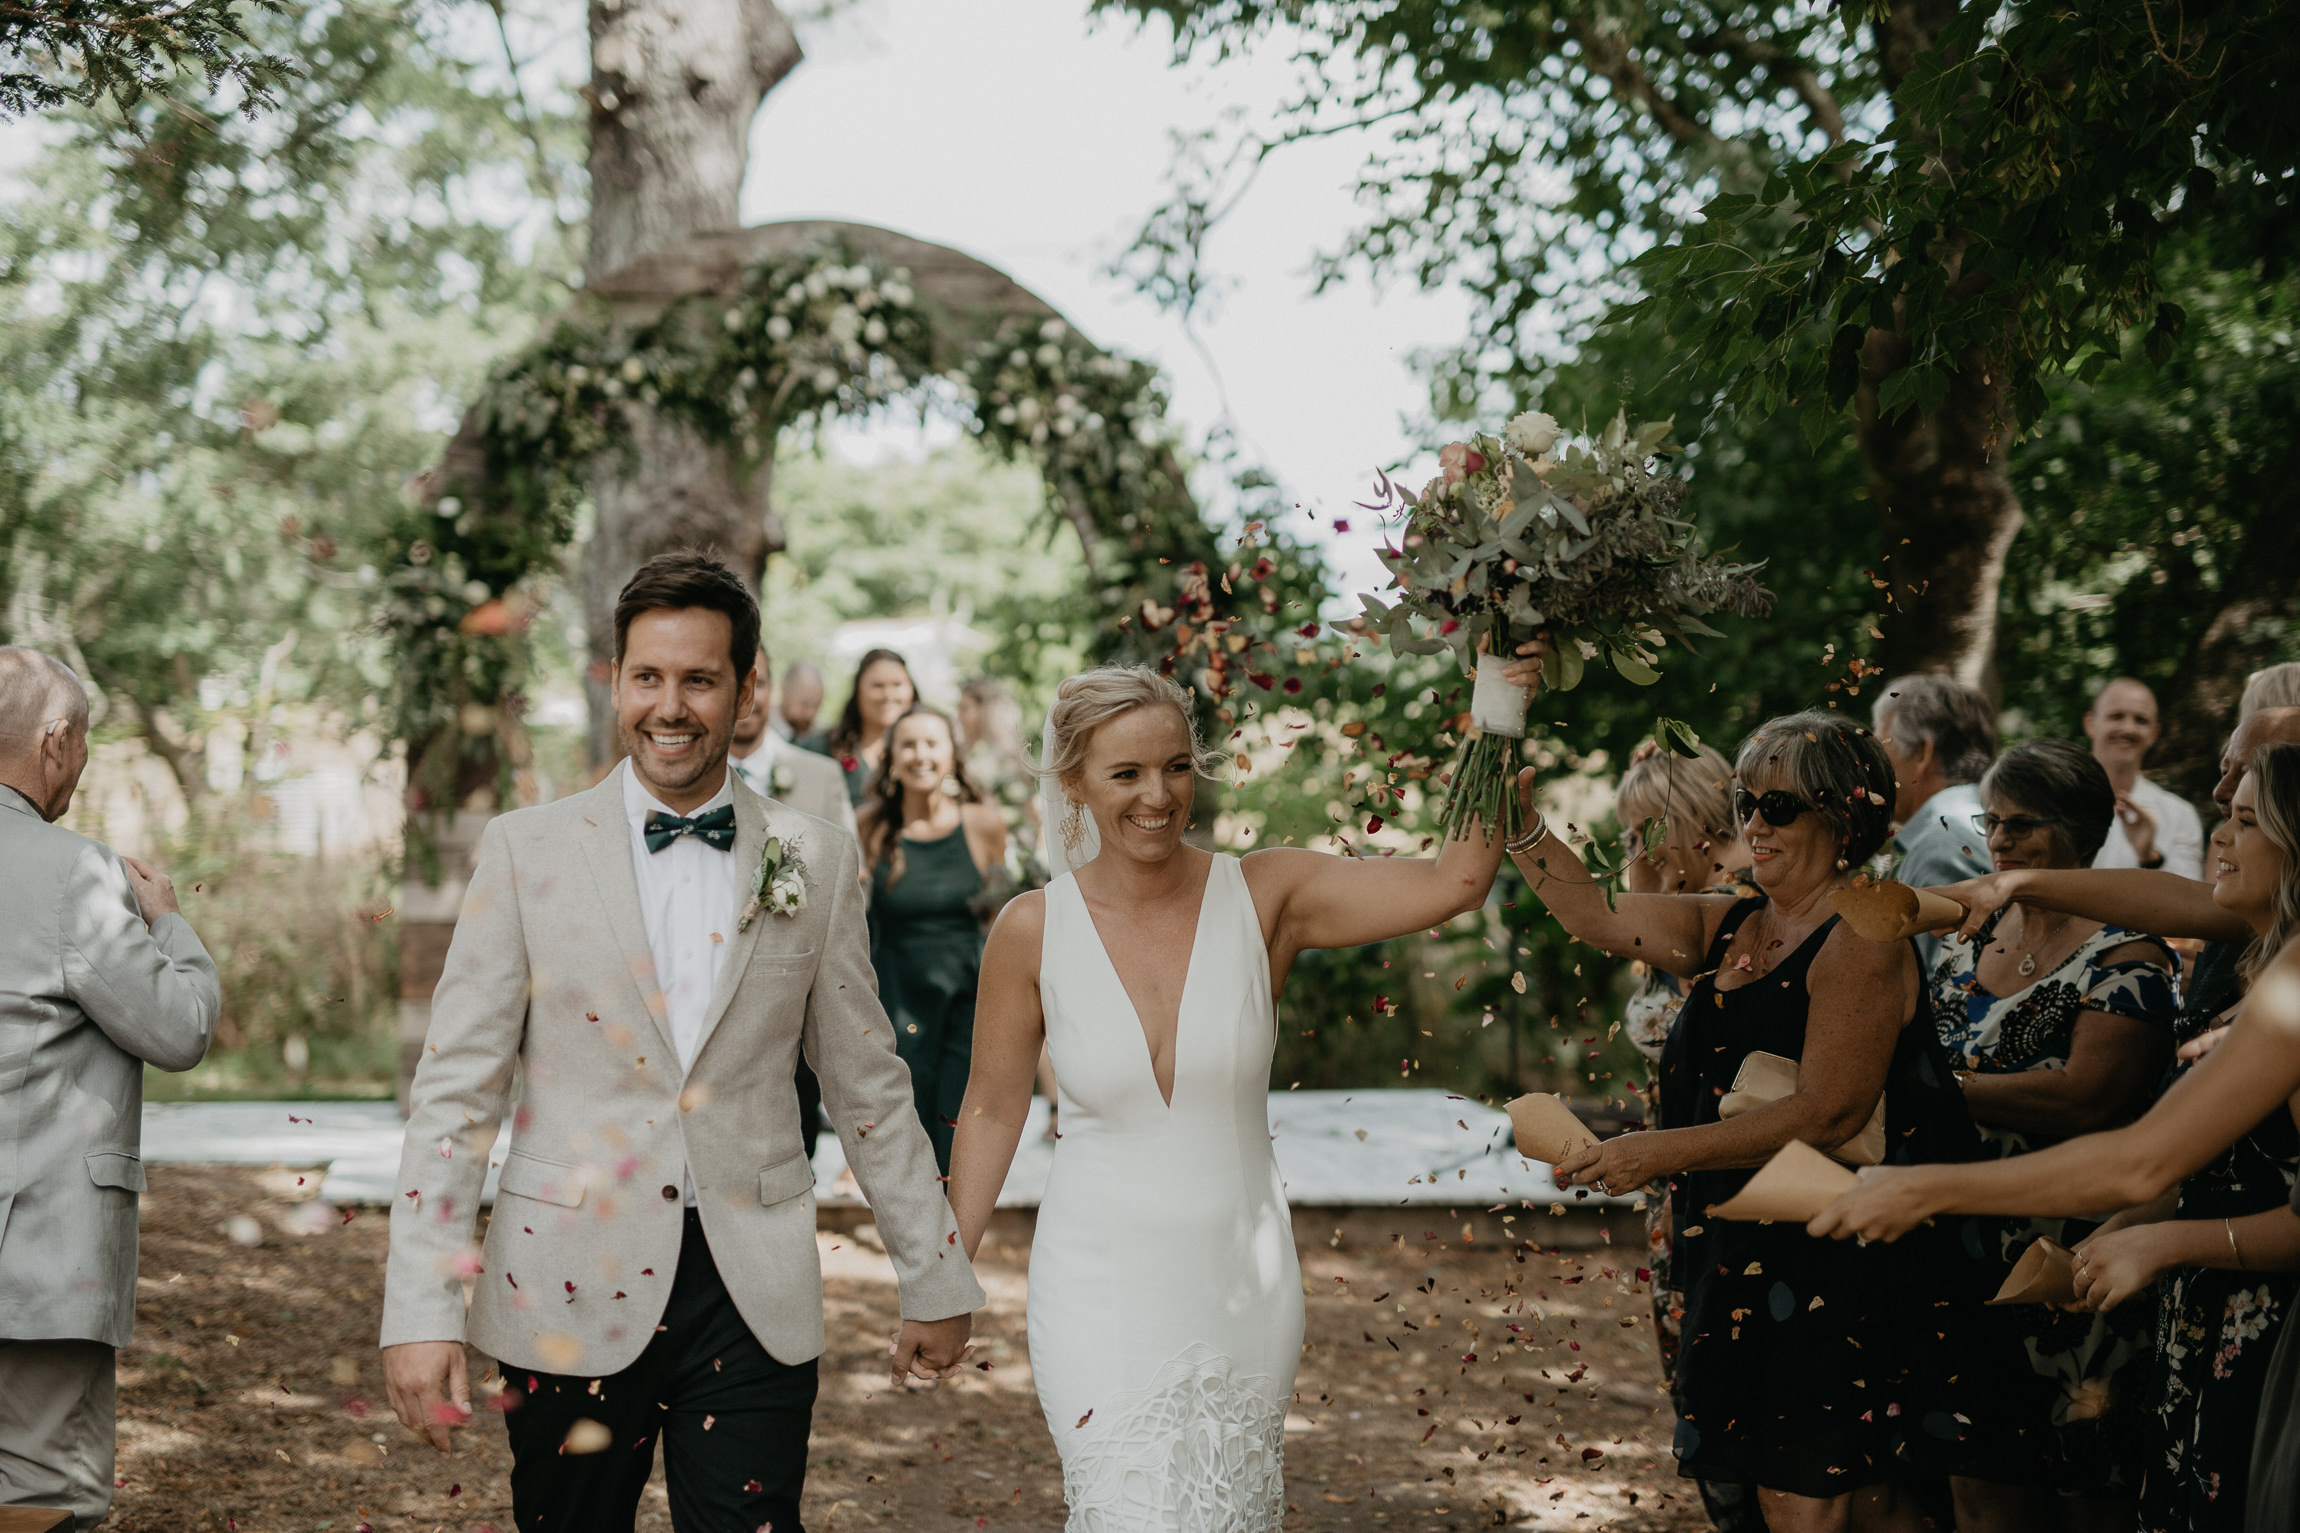 oldforestschool-wedding-blog-110.jpg